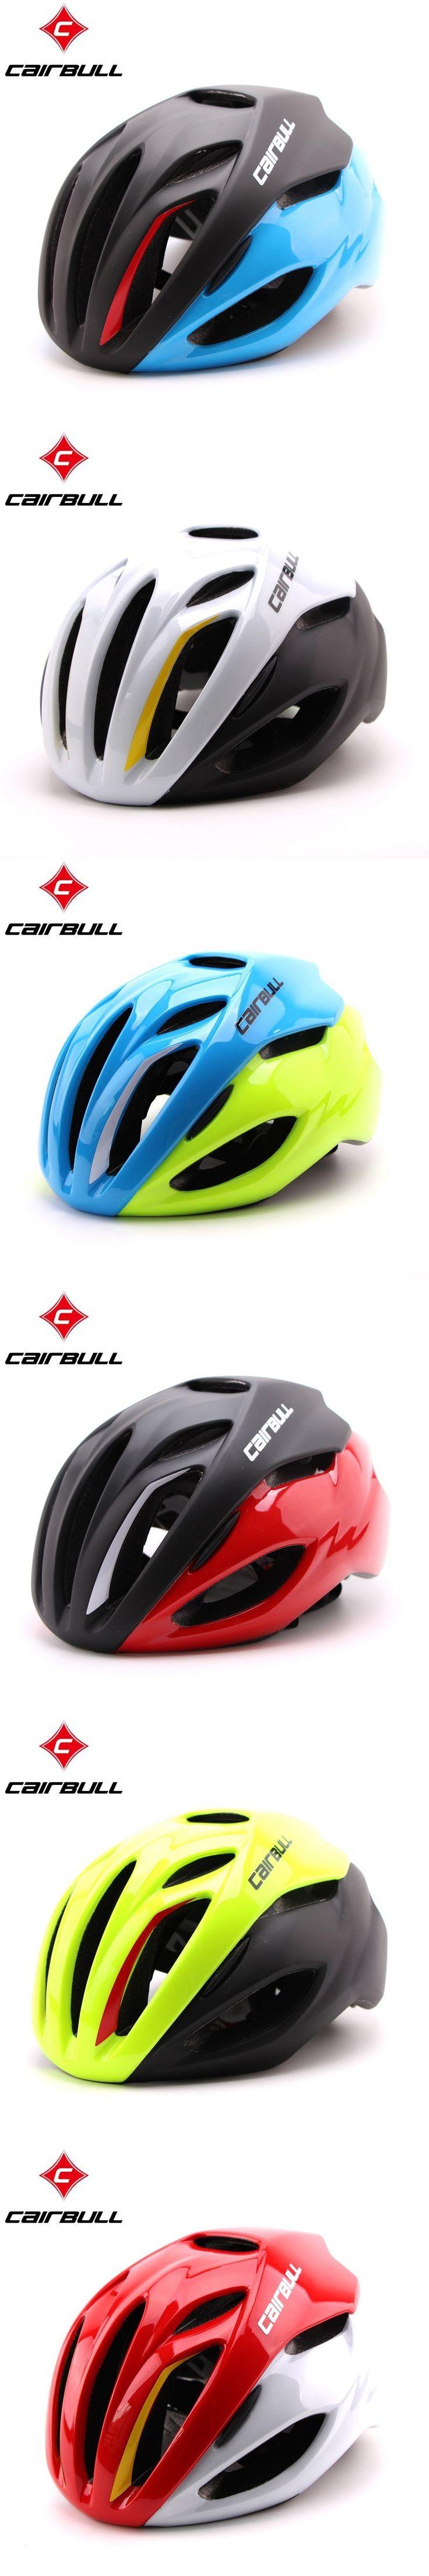 CAIRBULL Cycling Helmet PC+EPS Bicycle Helmet 20 Air Vents Breathable Ultralight Integrally-Molded Bike Helmet Casco Bicicleta